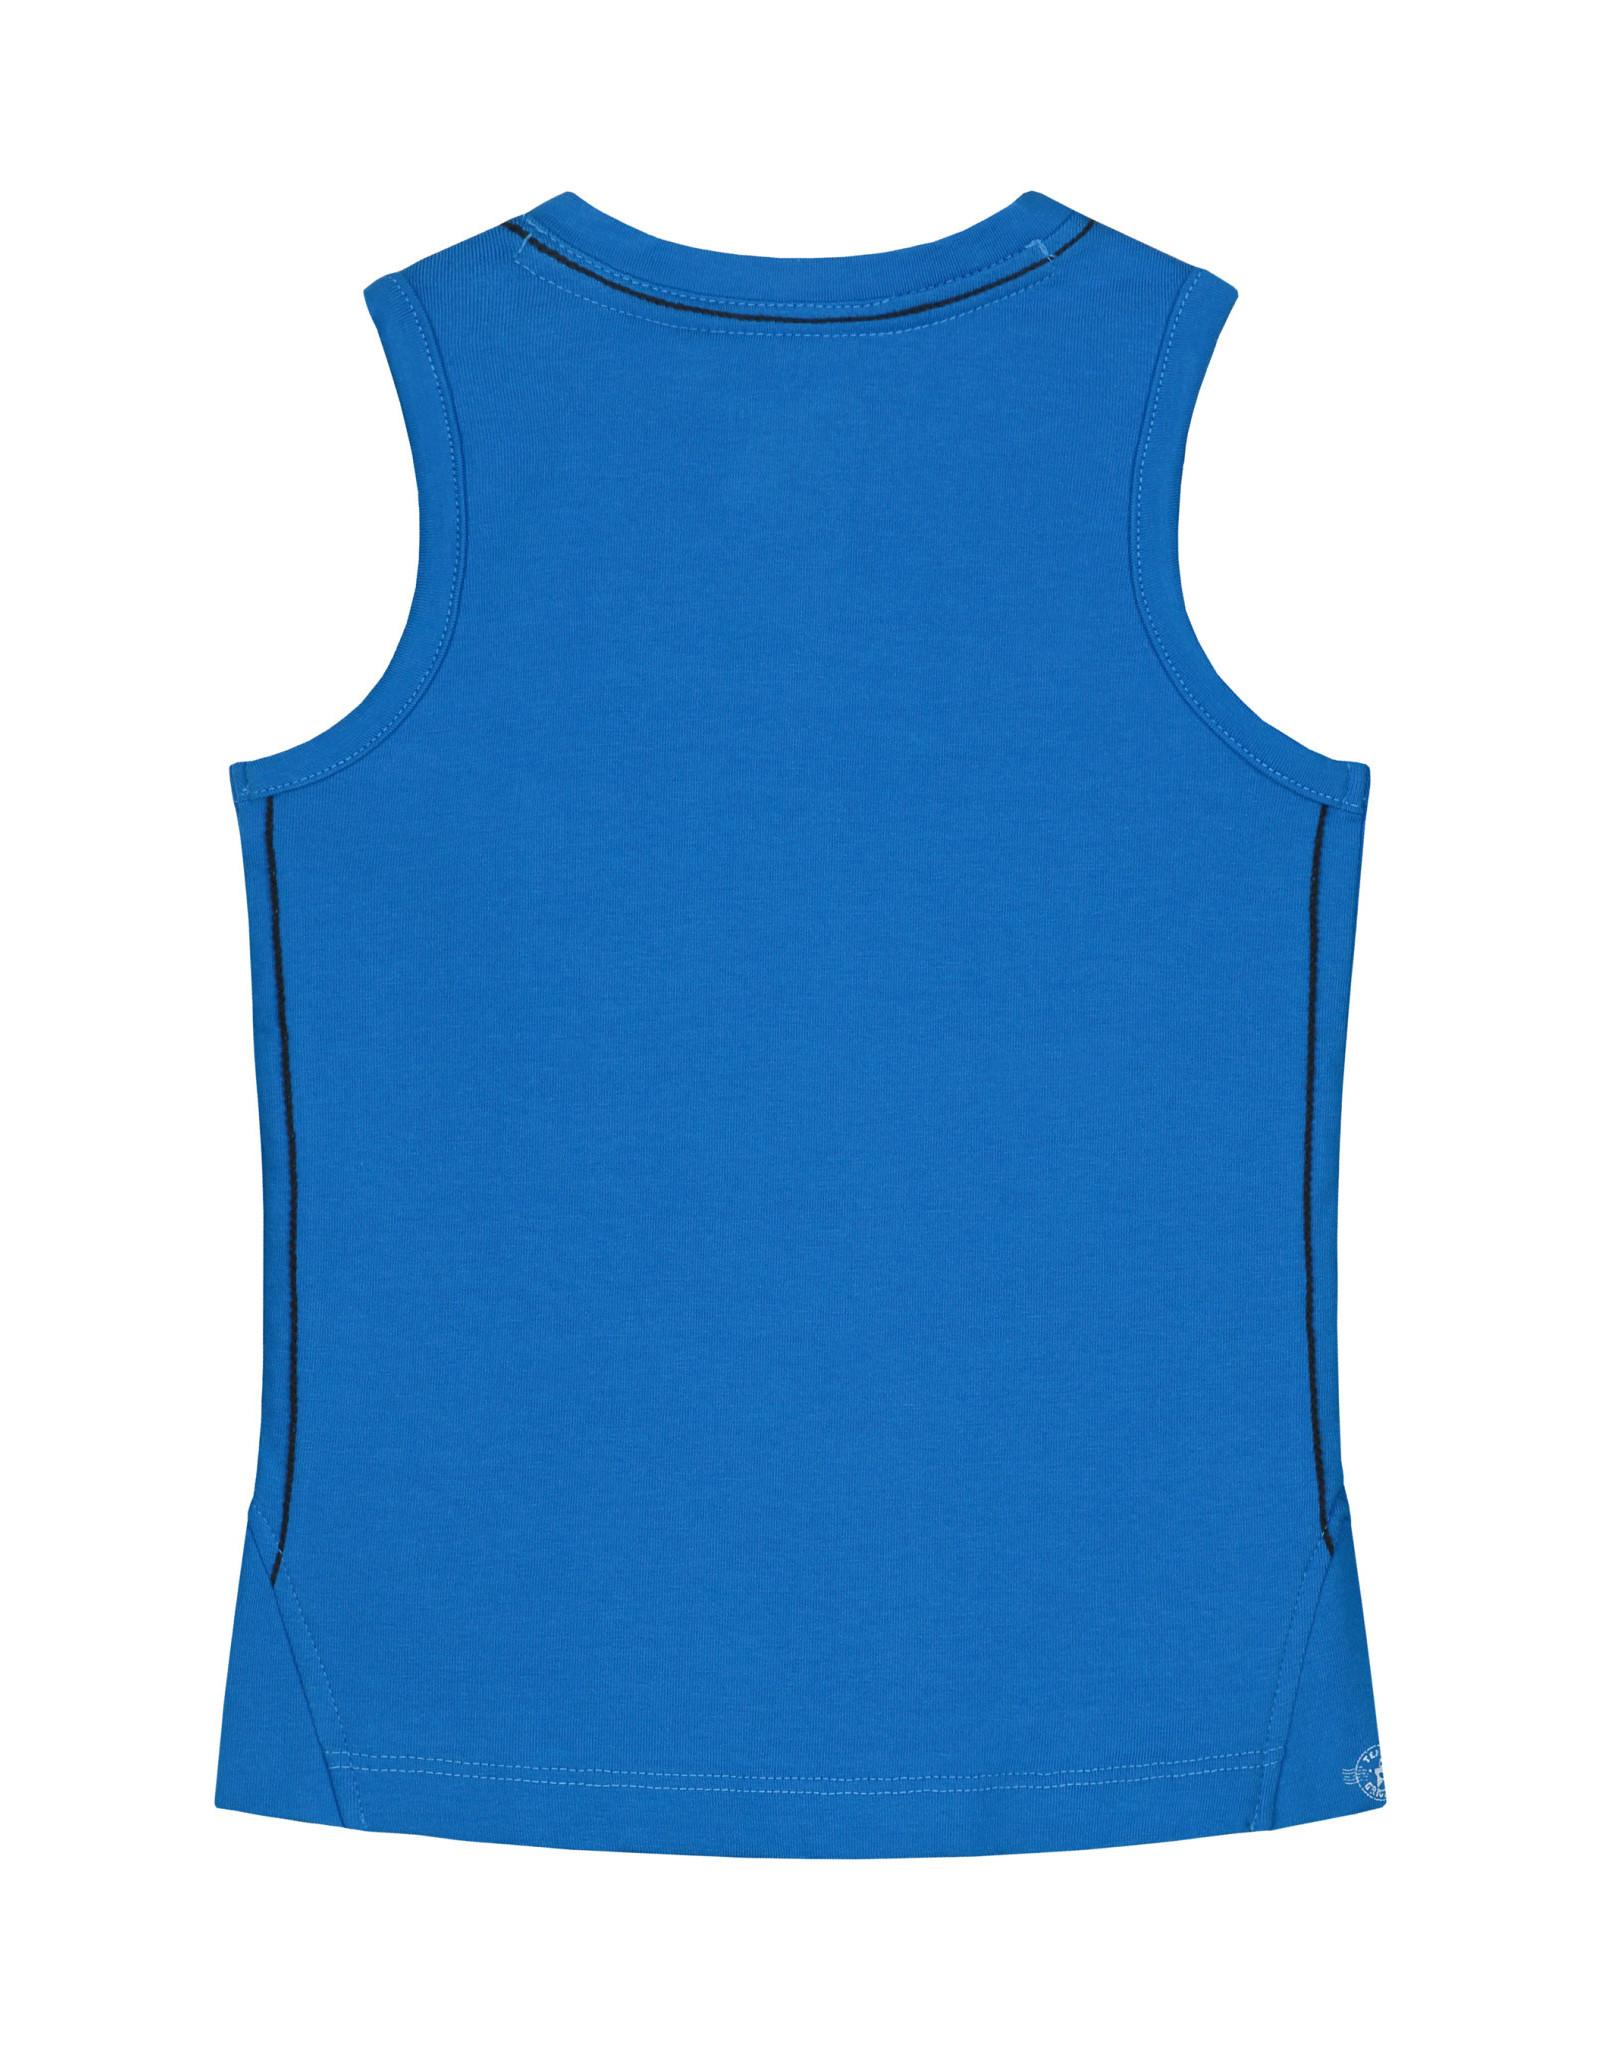 Quapi Quapi baby jongens hemd Bodi Fresh Blue